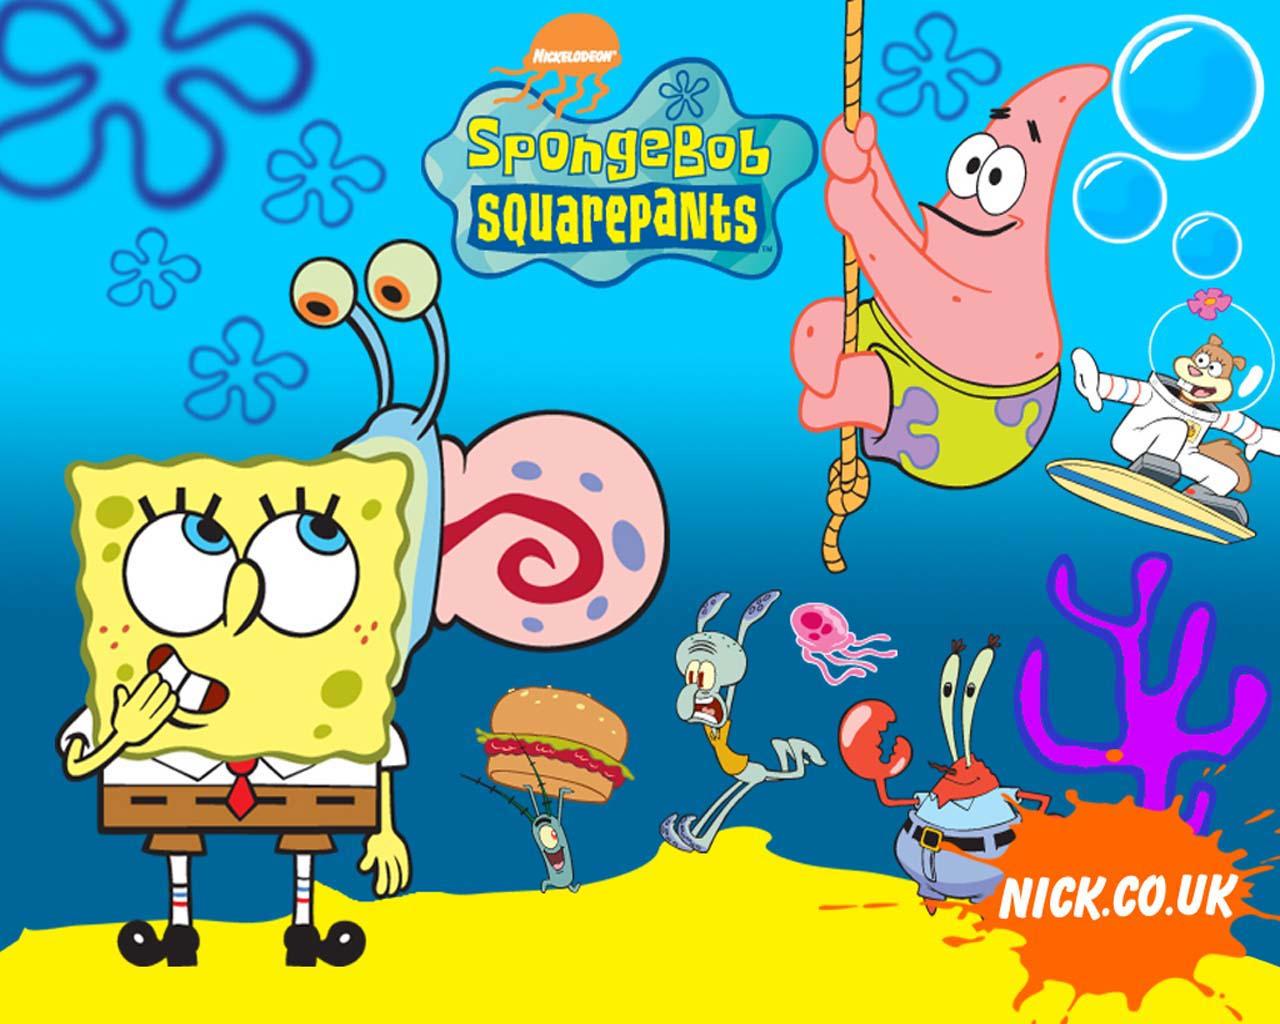 http://3.bp.blogspot.com/-9a9To7P1AYc/TWUO116xFZI/AAAAAAAABB4/WA7lDas-wN8/s1600/spongebob-wallpaper-042.jpg